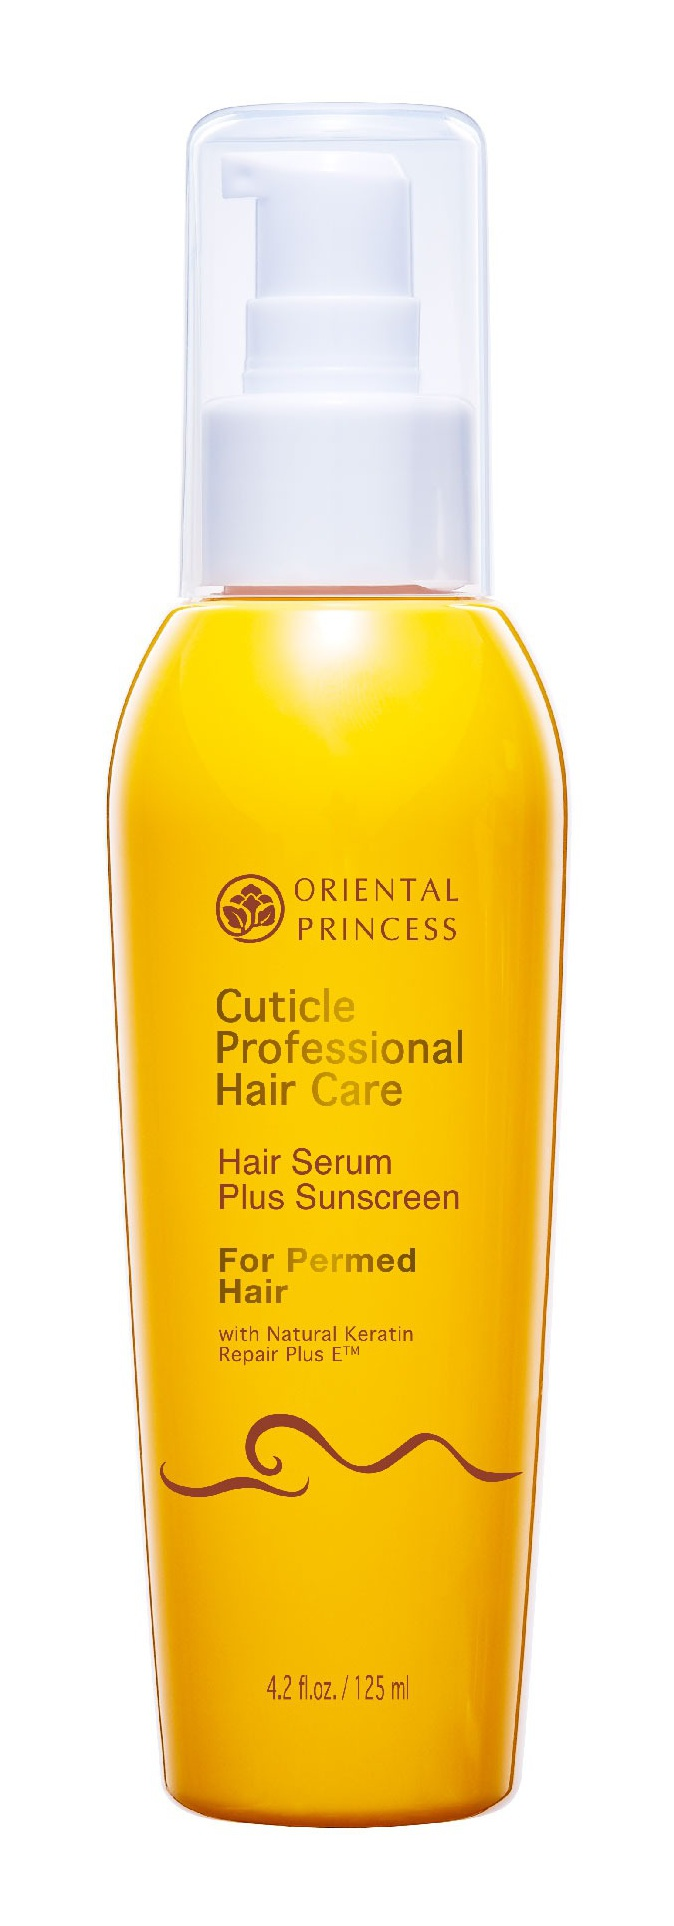 Oriental Princess Cuticle Professional Hair Care